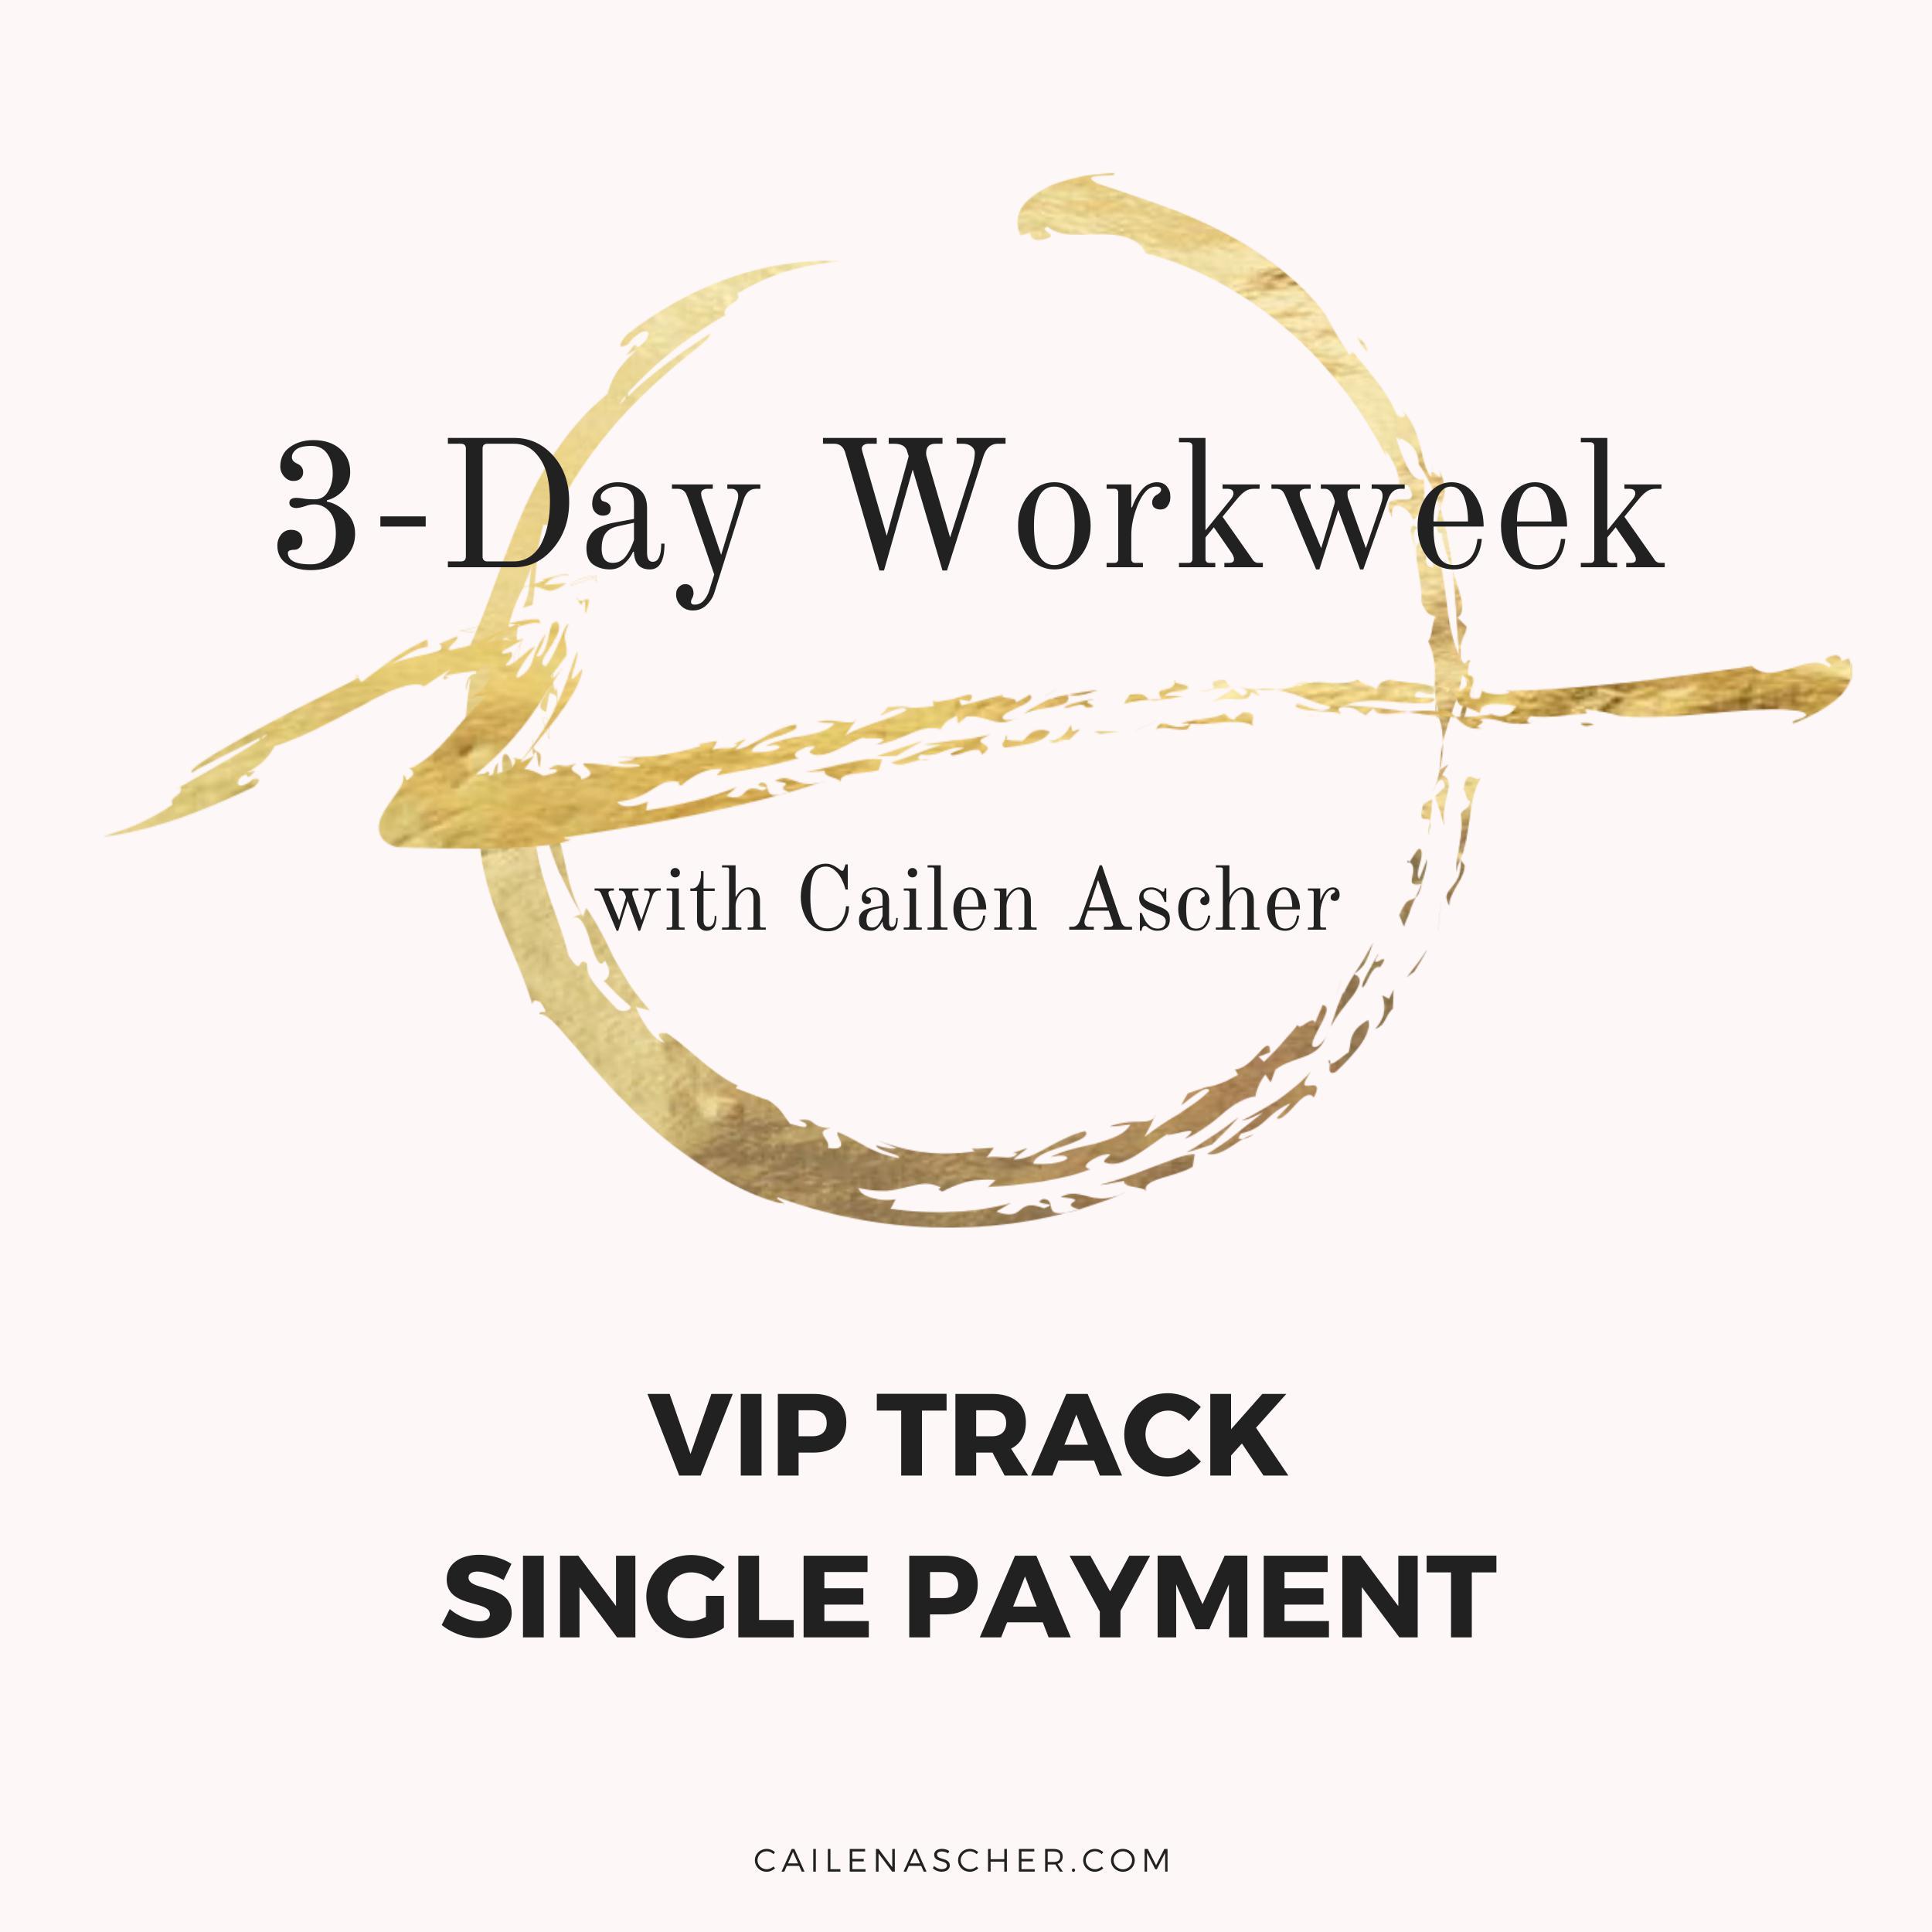 Cailen Ascher - 3-Day Workweek Program - Payment Plan Option Image - VIP Track Single Payment.jpg